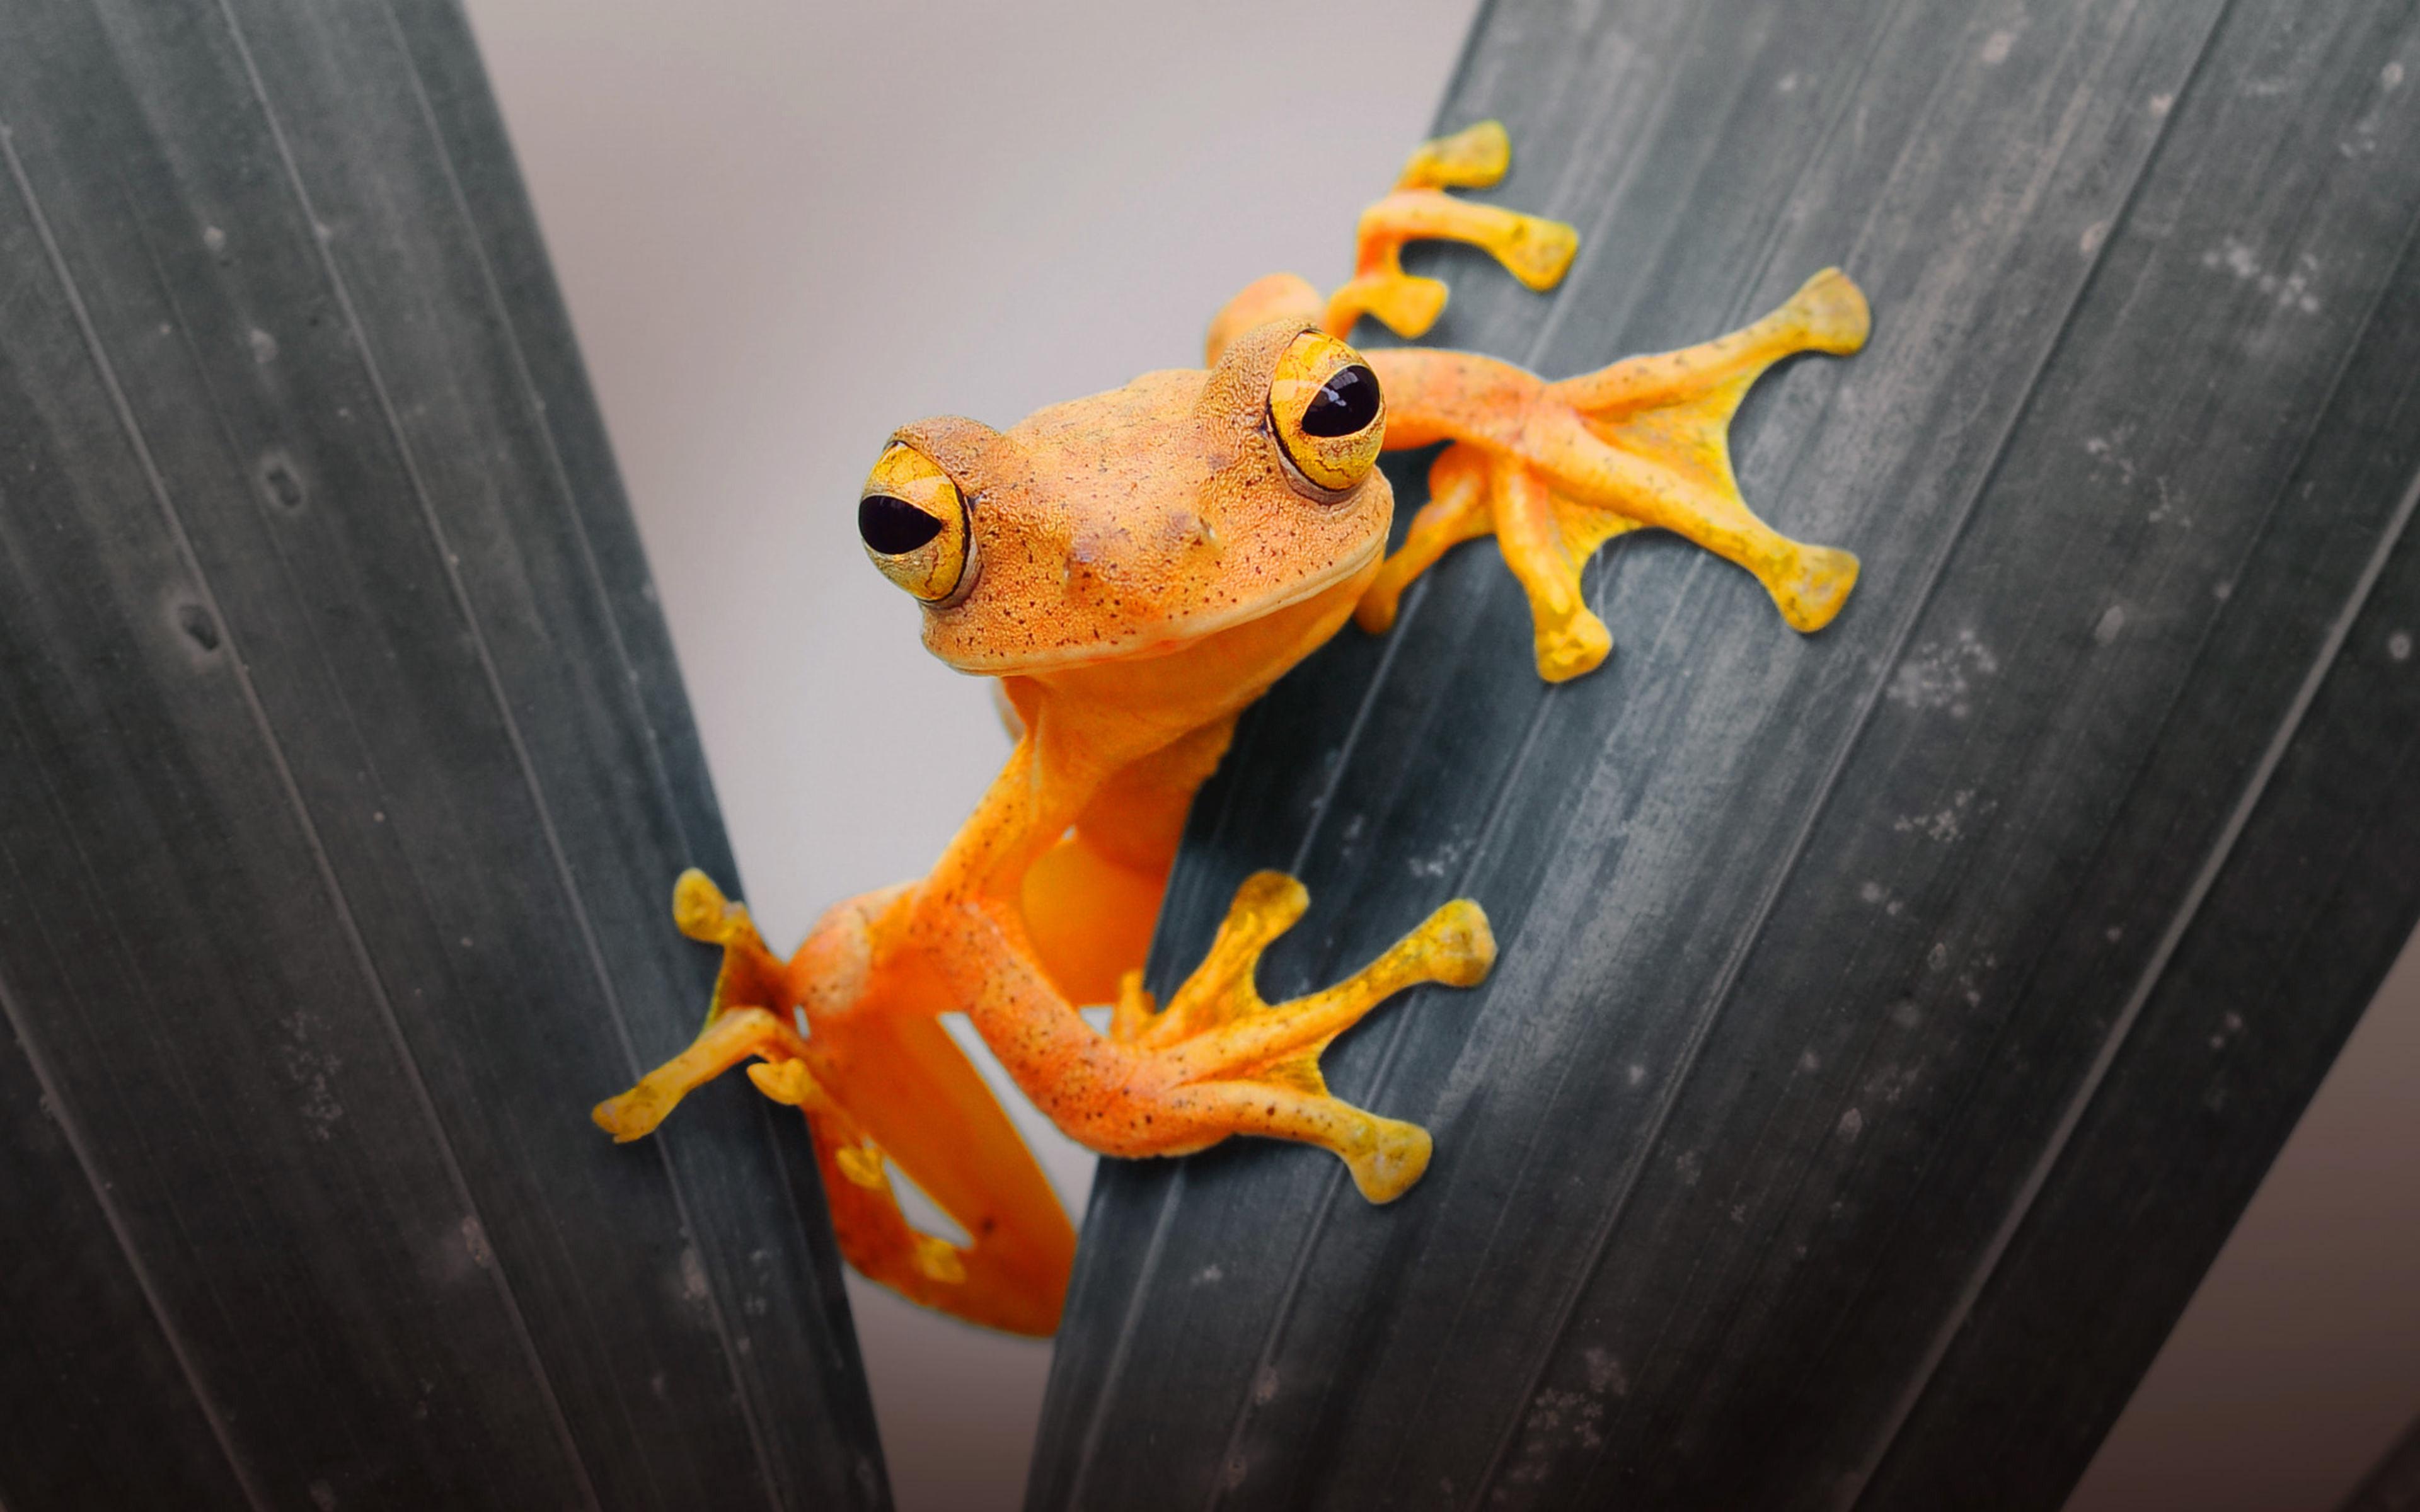 HDoboi.Kiev.ua - Оранжевая лягушка 4k ultra hd, фото жаба на обои